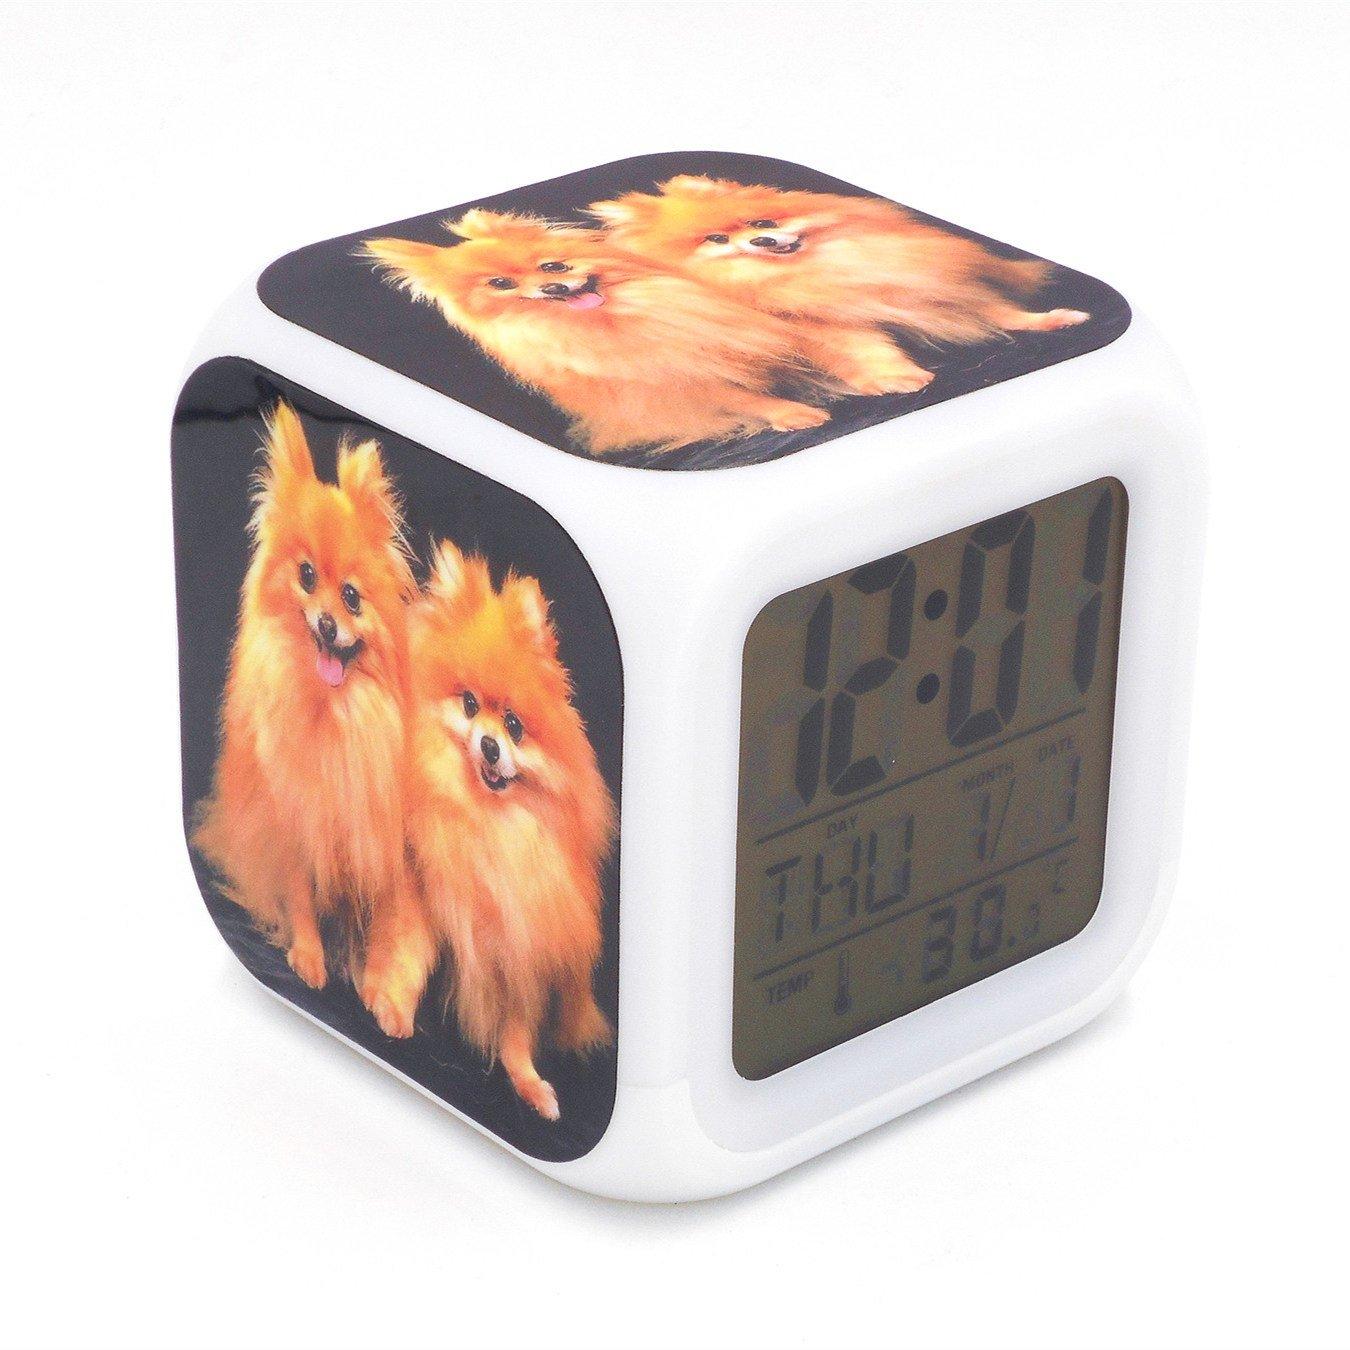 Boyan New Pomeranian Dog Puppy Animal Led Alarm Clock Creative Desk Table Clock Multipurpose Calendar Snooze Glowing Led Digital Alarm Clock for Unisex Adults Kids Toy Gift